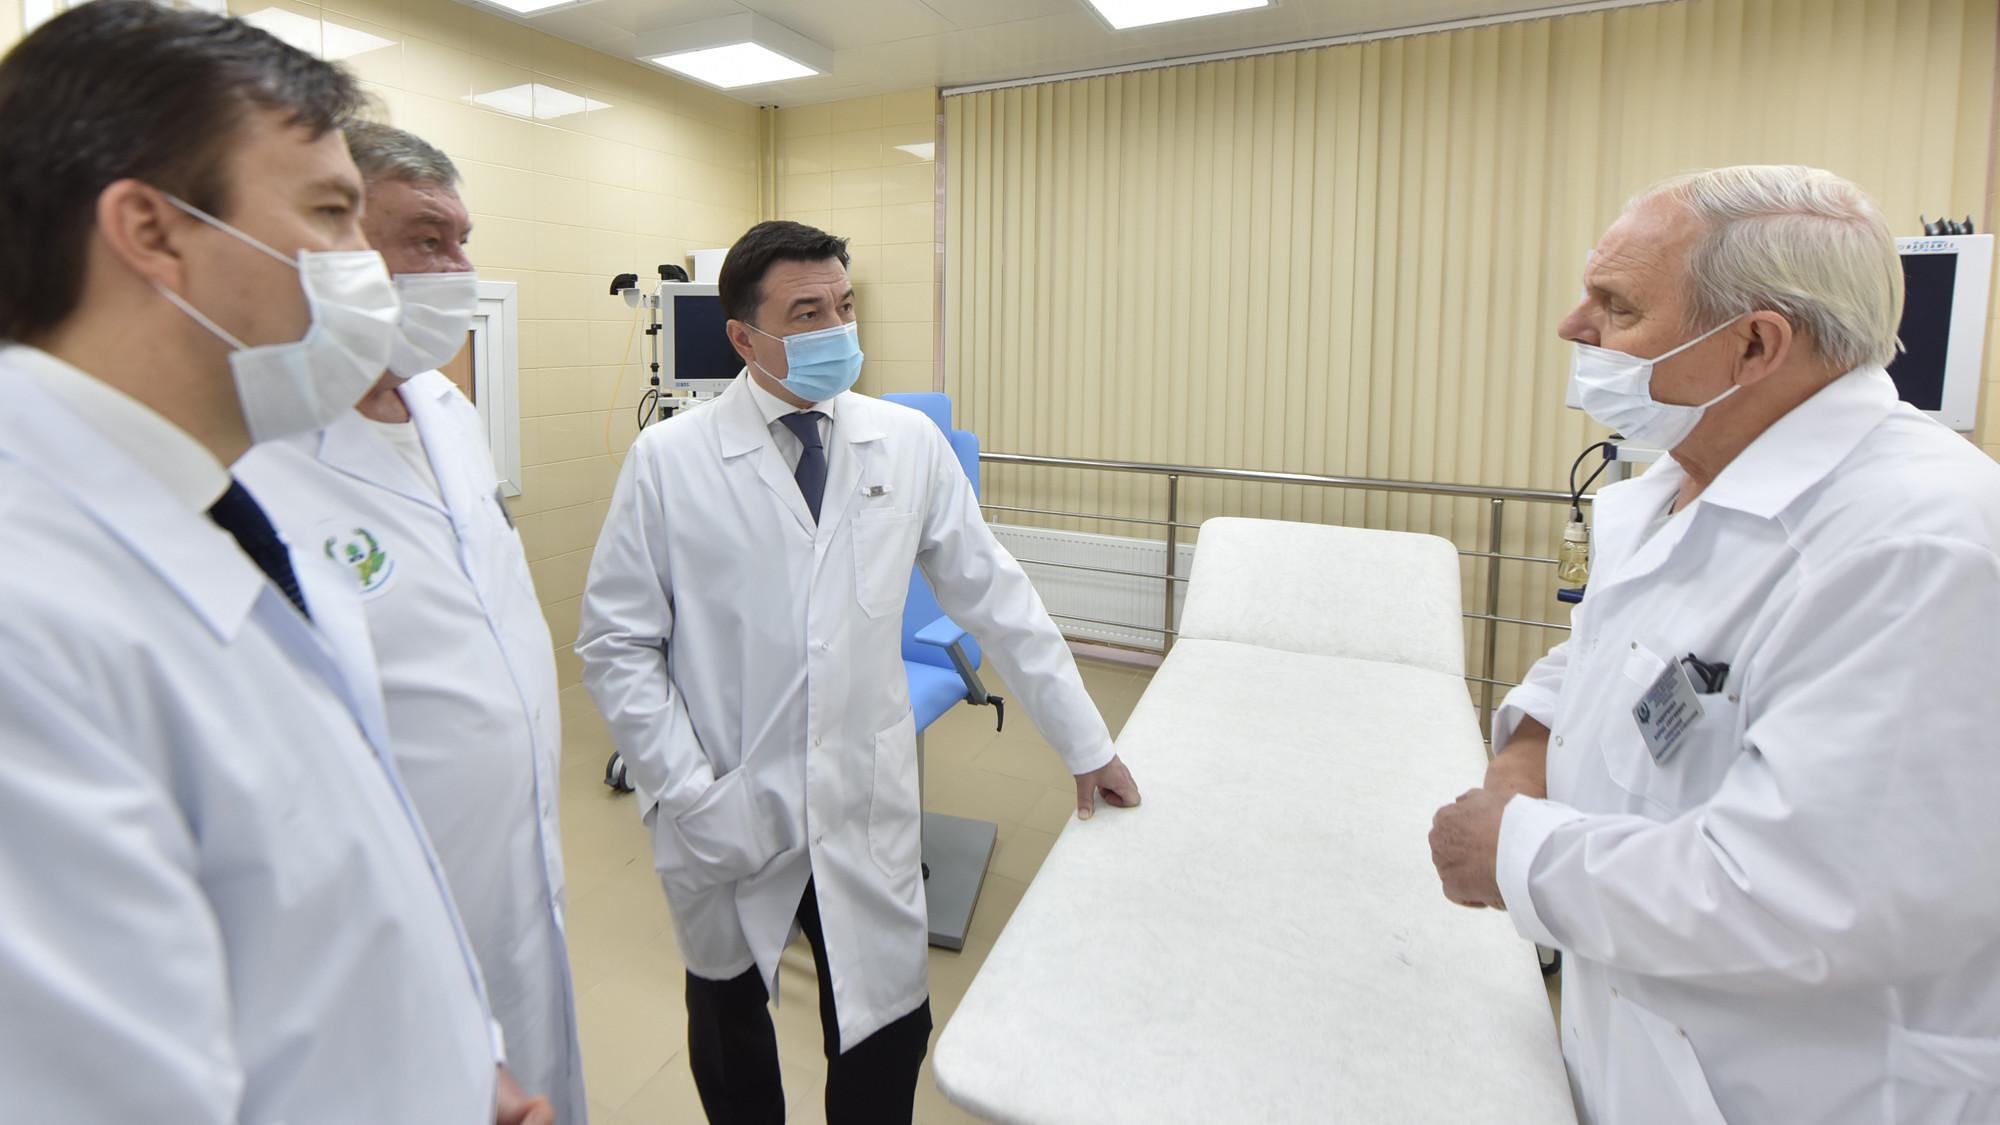 Андрей Воробьев проверил работу нового хирургического центра в Дубне